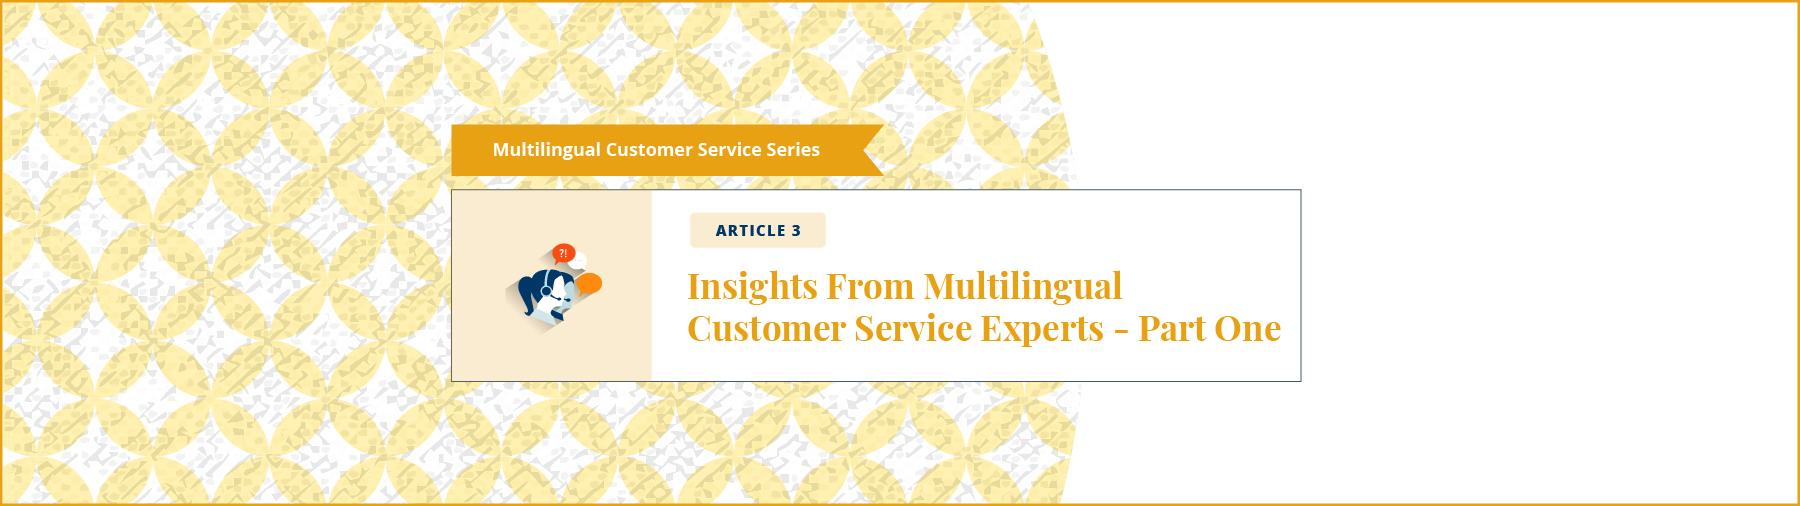 Multilingual Customer Service Experts